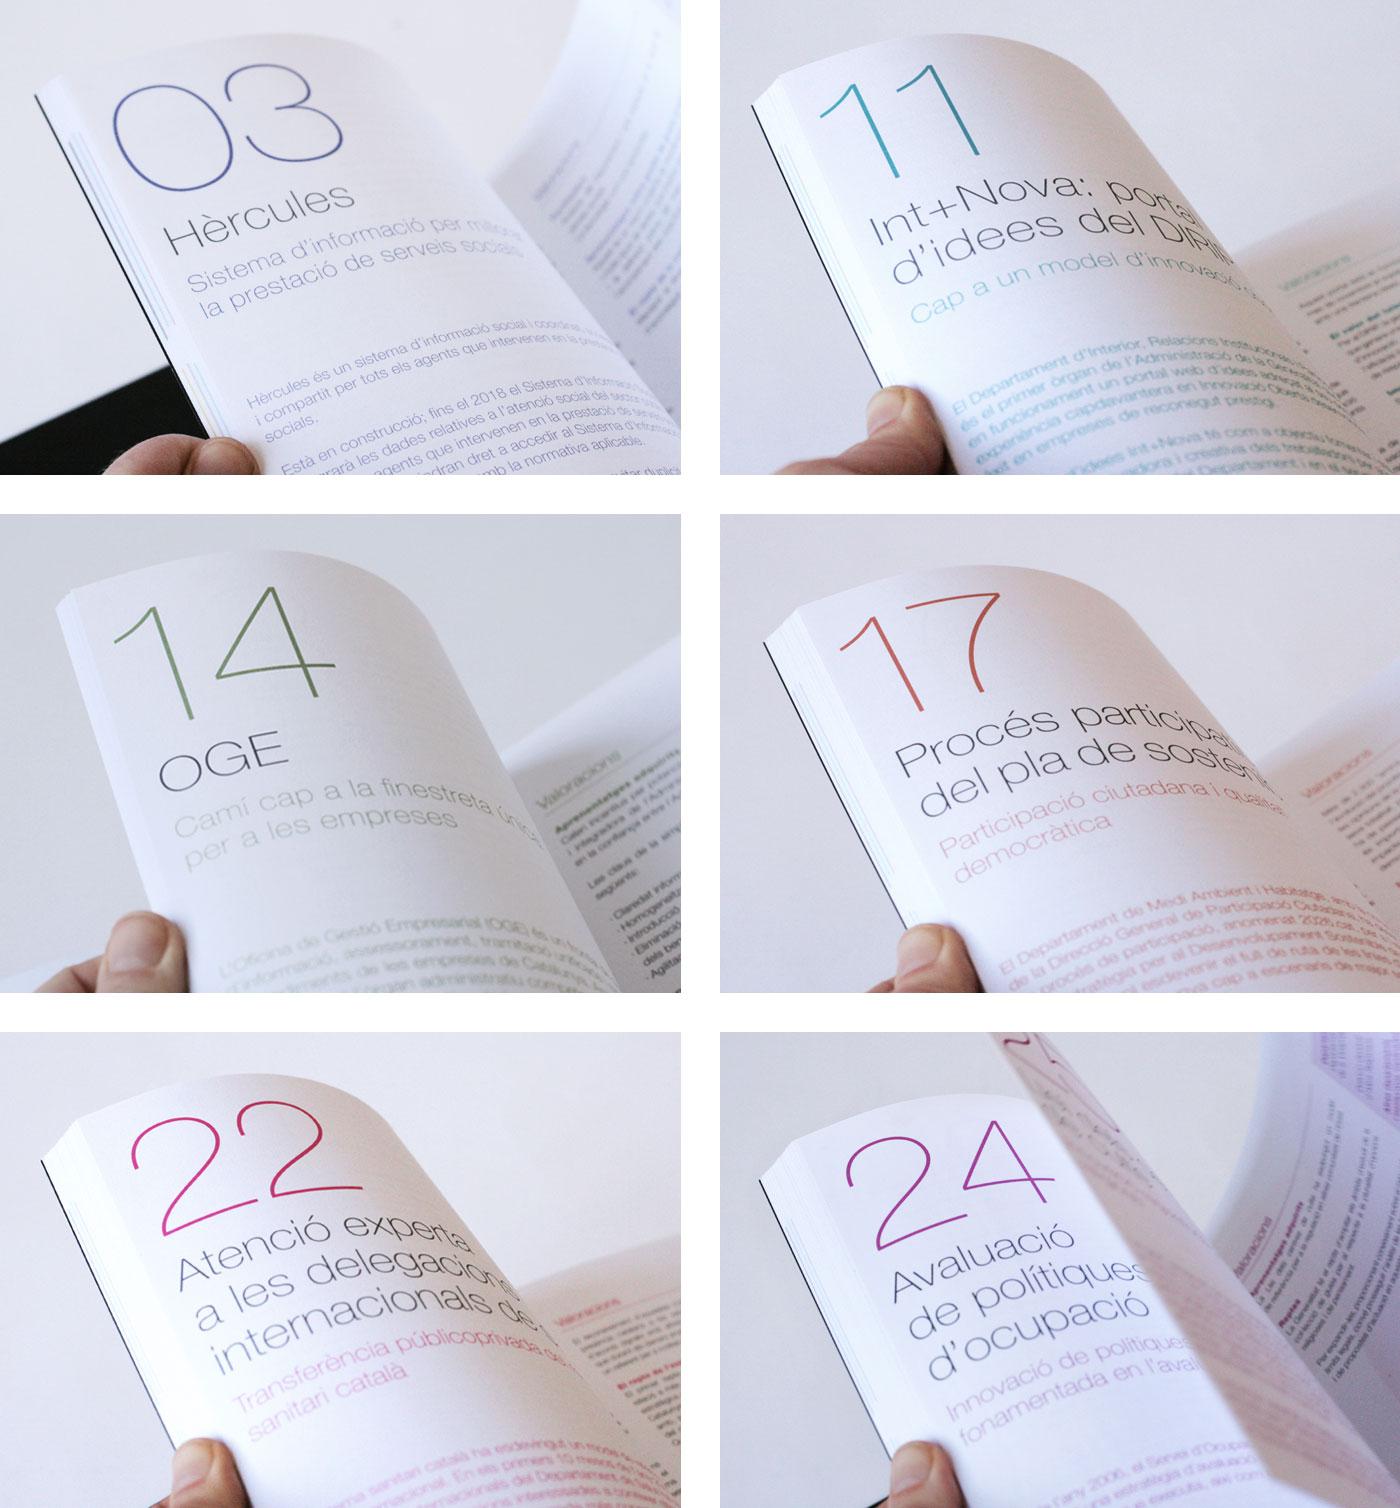 llibre-innogencat-generalitat-catalunya